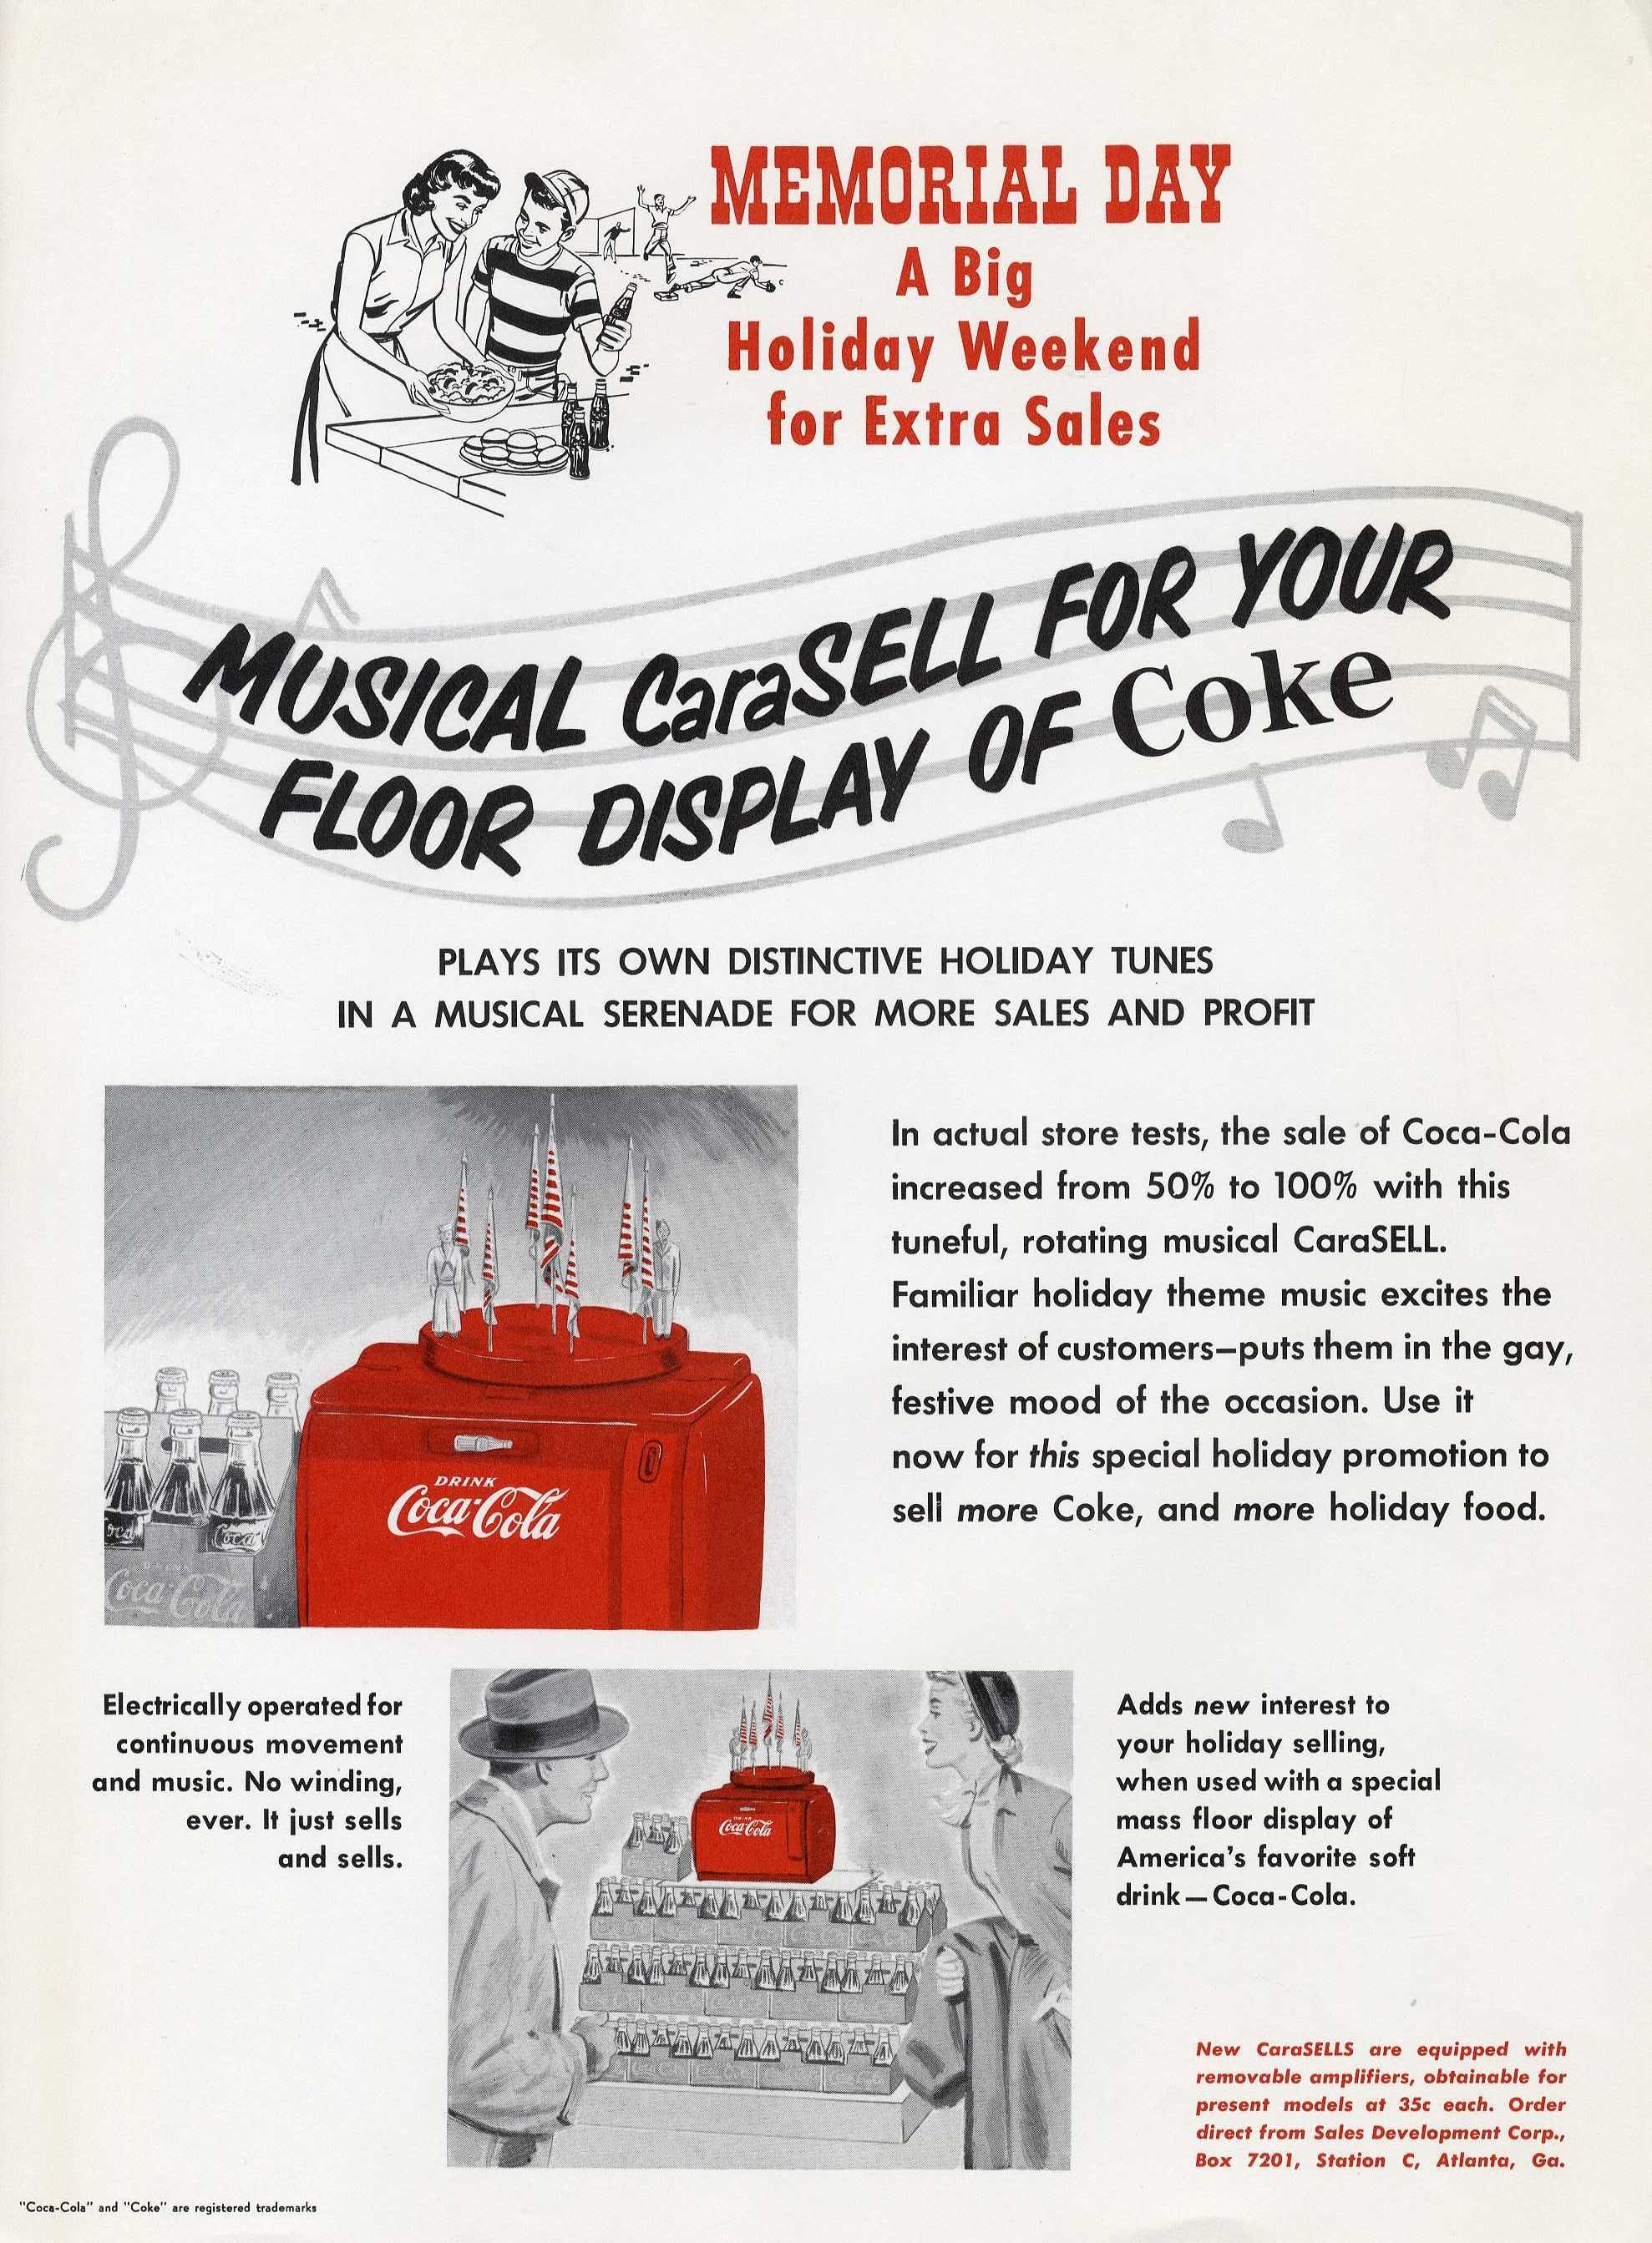 (coke code 201) 특별한 코카-콜라 아이스 쿨러를 소개해드립니다! 이름하여 Holiday CaraSell :) 특별한 휴일 코-크 아이스 쿨러와 함께라면 정말 행복하겠죠? :D